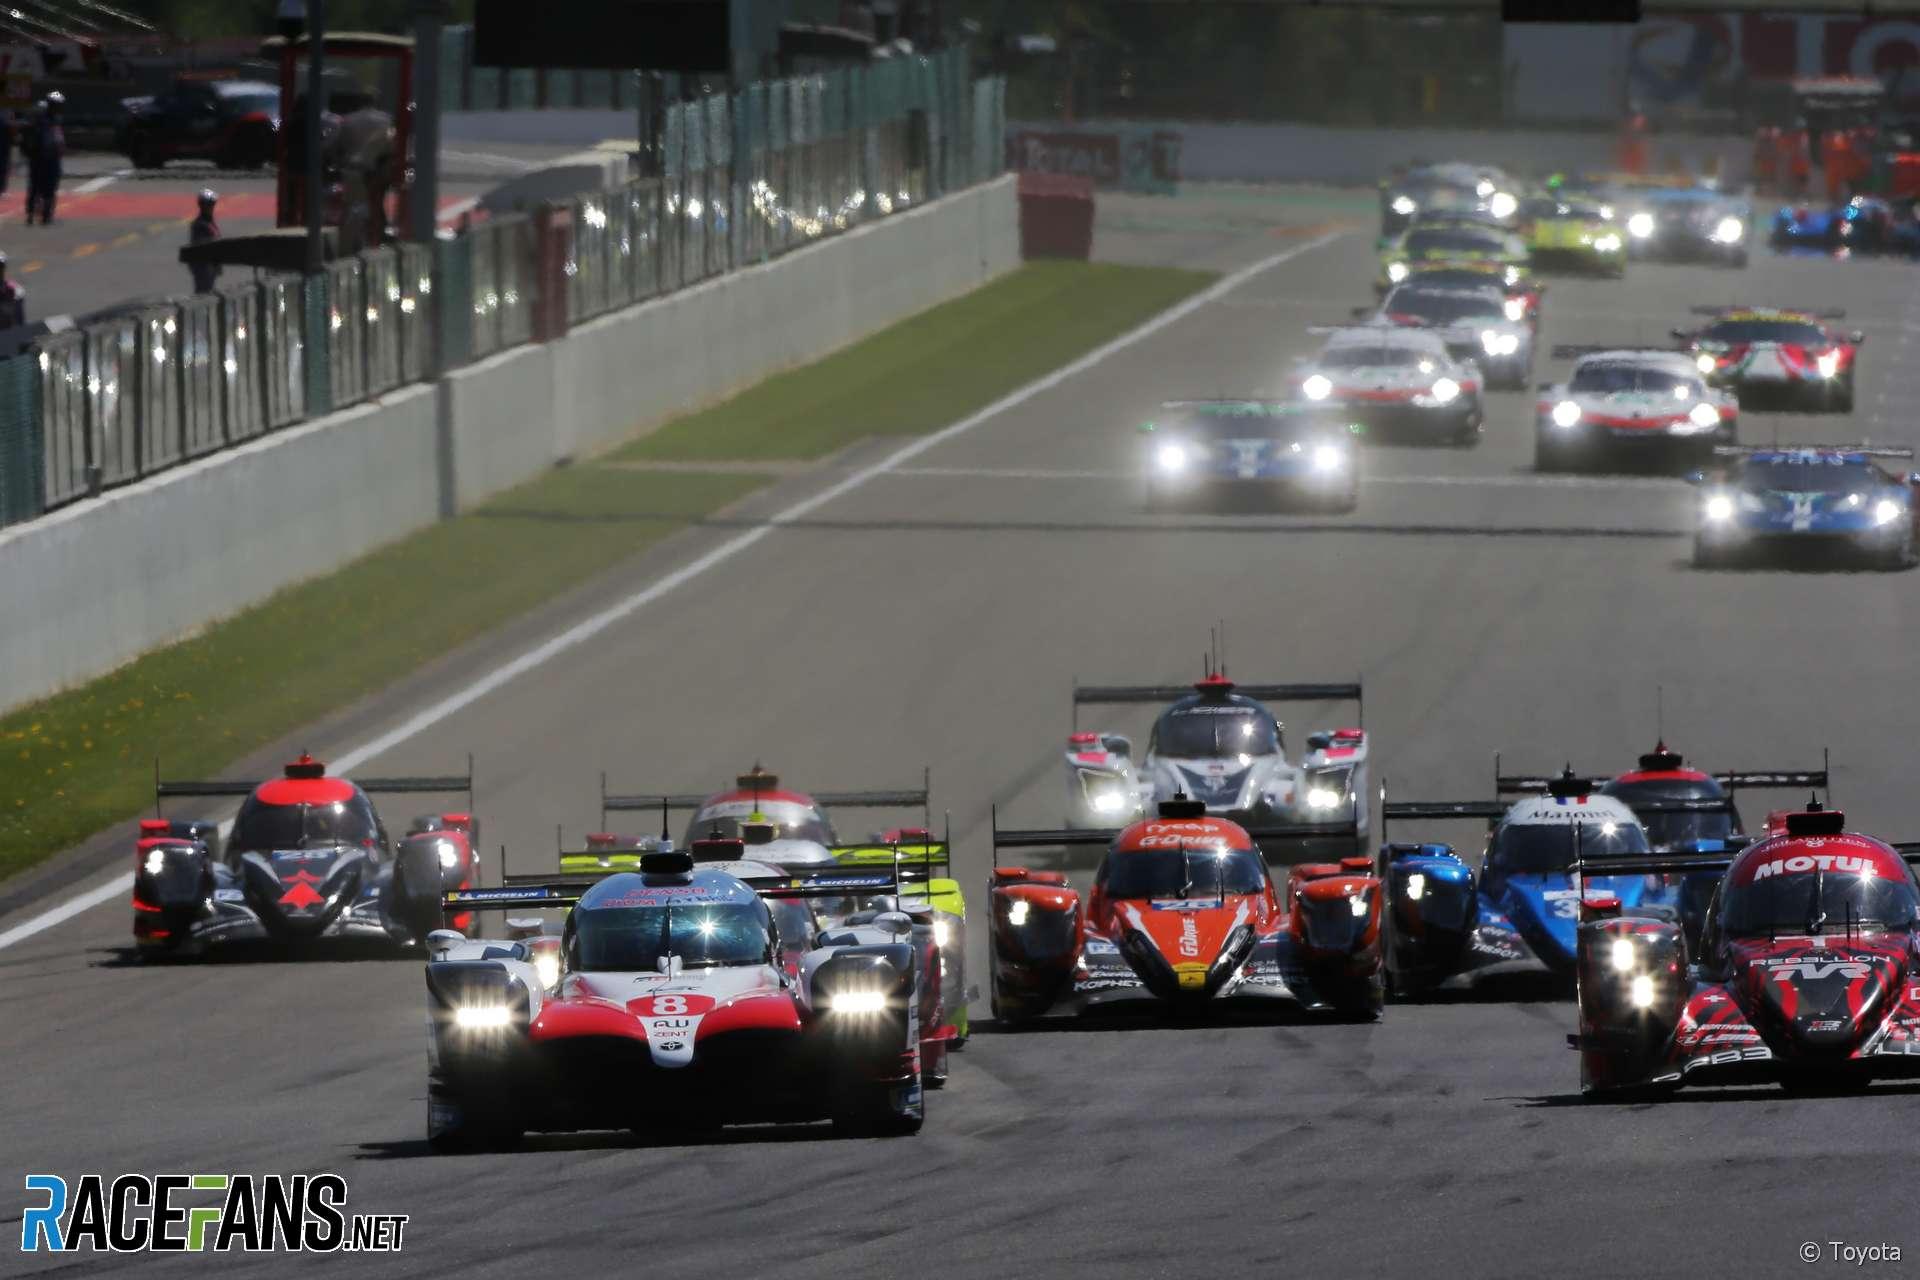 Toyota, Spa-Francorchamps, WEC, 2018 · RaceFans